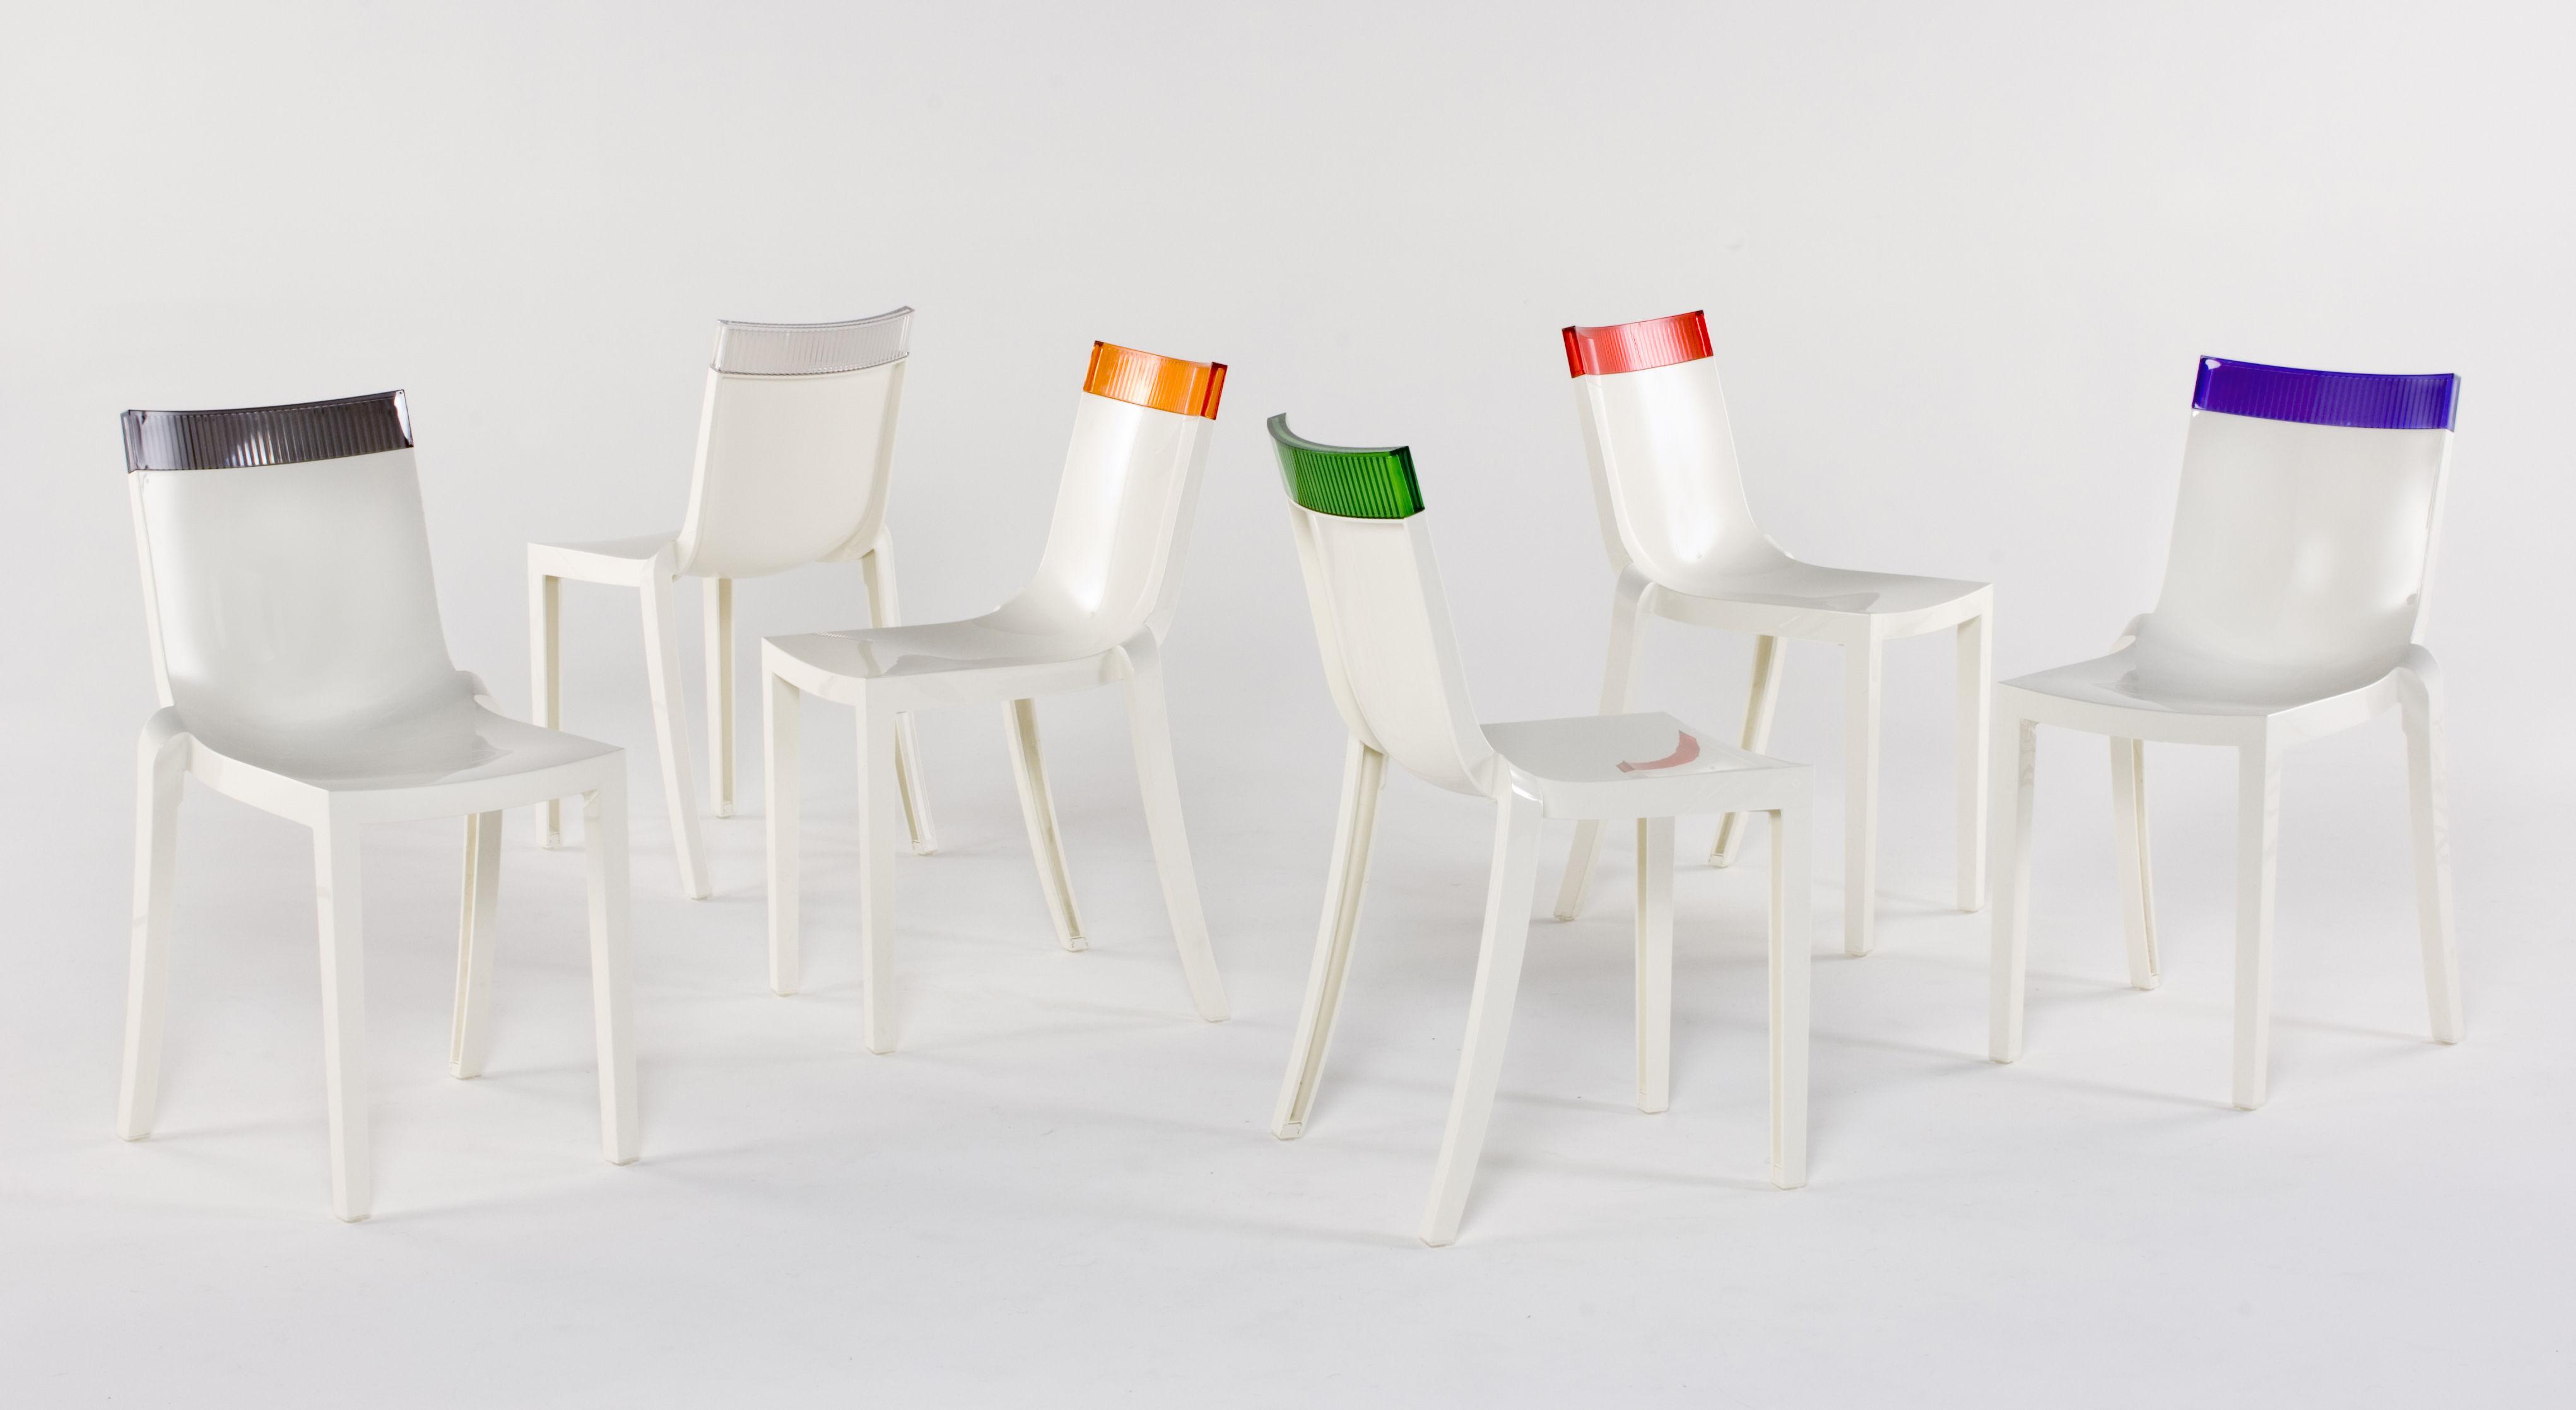 chaise empilable hi cut blanche polycarbonate blanc laqu gris kartell. Black Bedroom Furniture Sets. Home Design Ideas